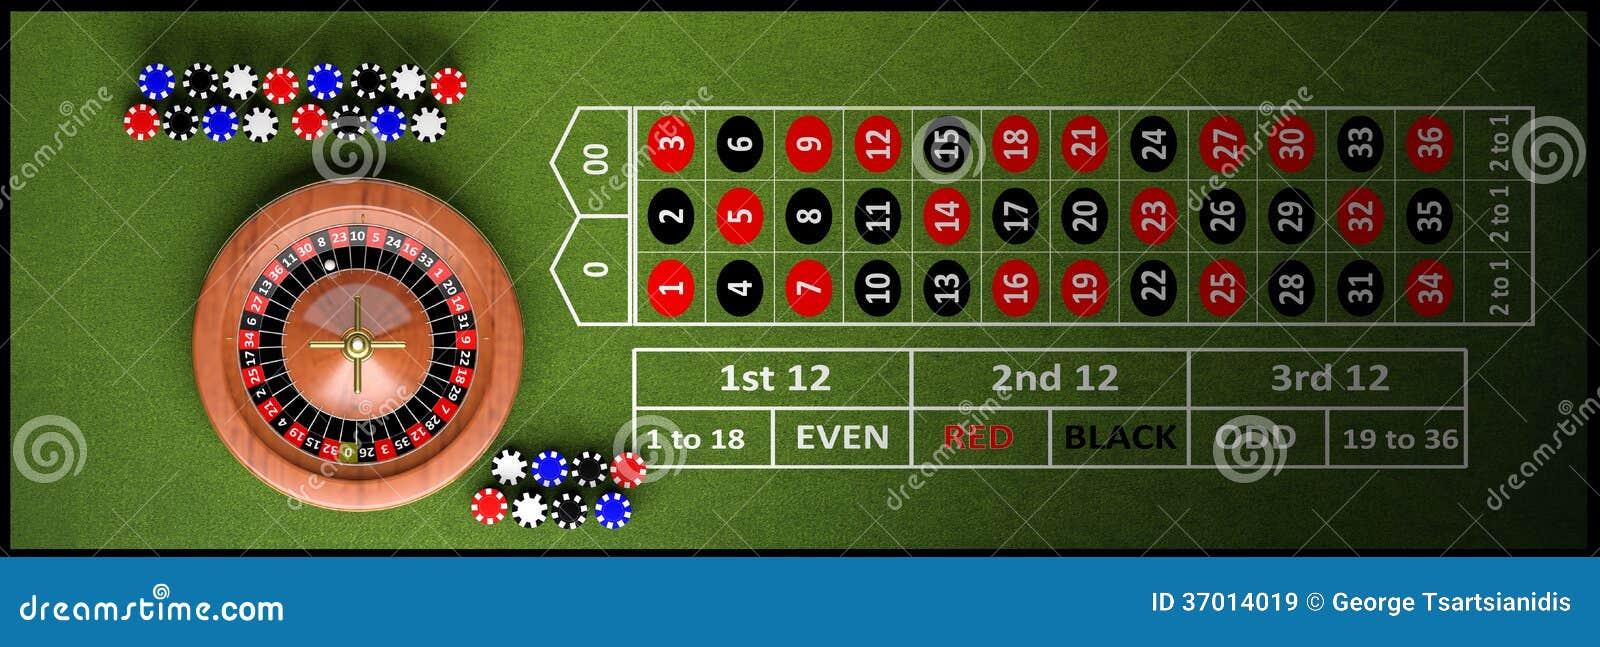 online casino no download poker american